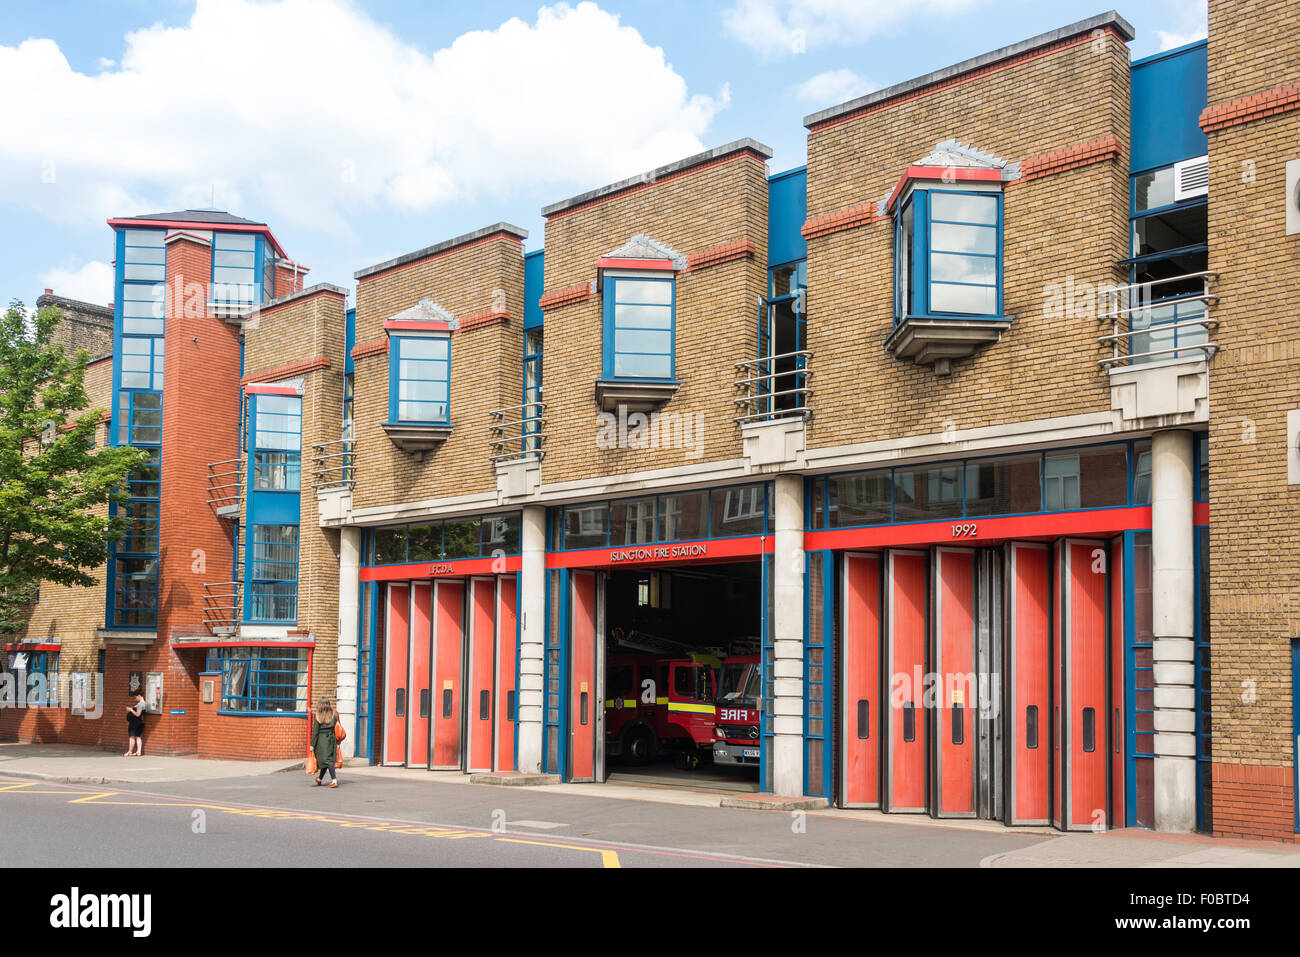 Islington Fire Station, Upper Street, Islington, London Borough of Islington, London, England, United Kingdom - Stock Image